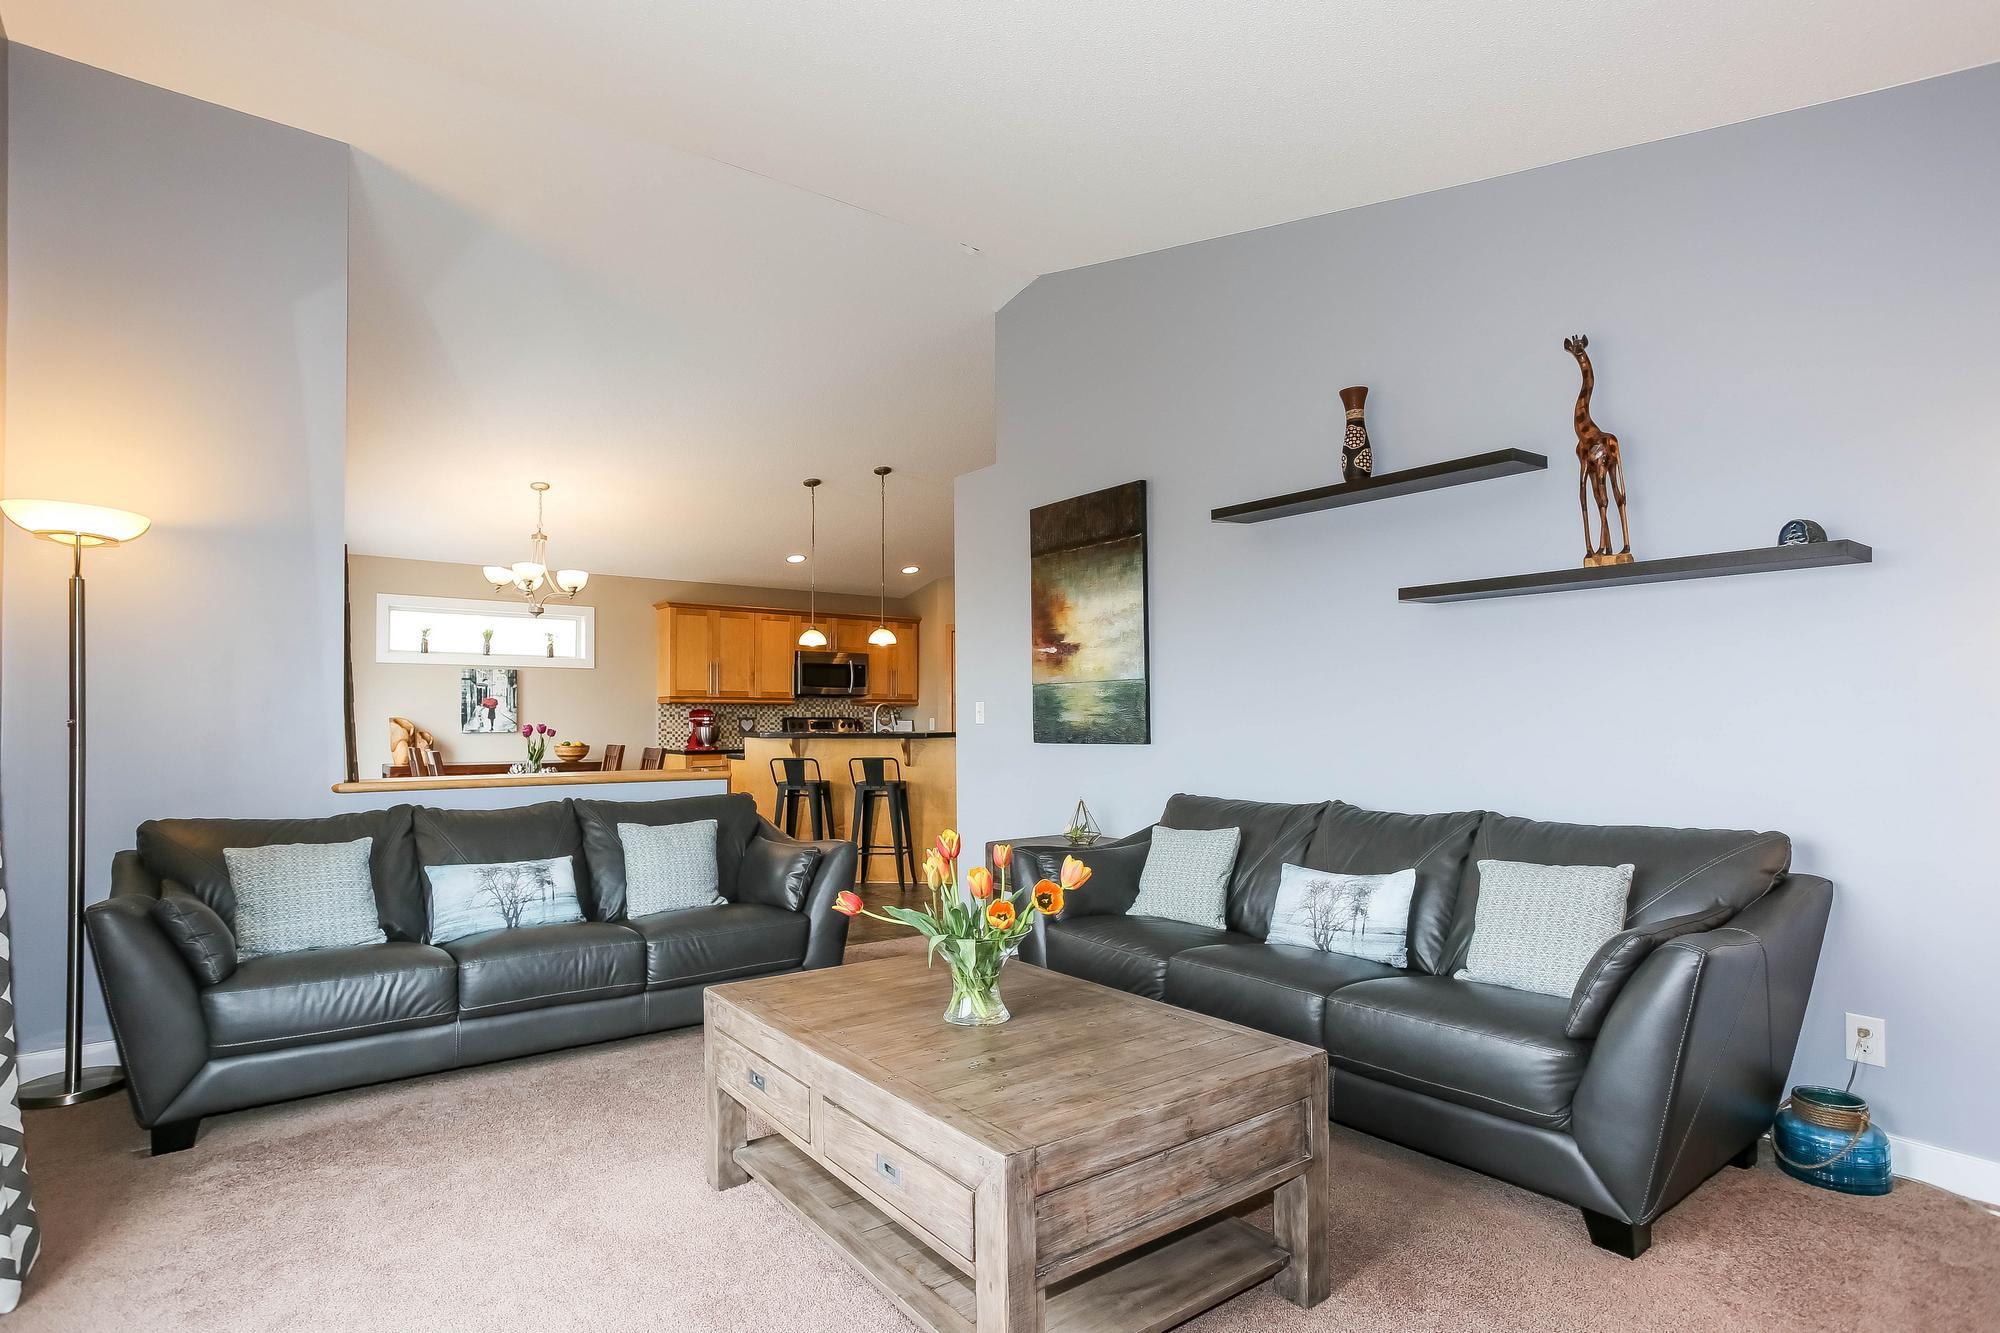 151 Kingfisher Crescent, Winnipeg, Manitoba  R3Y 1S3 - Photo 40 - 202008673